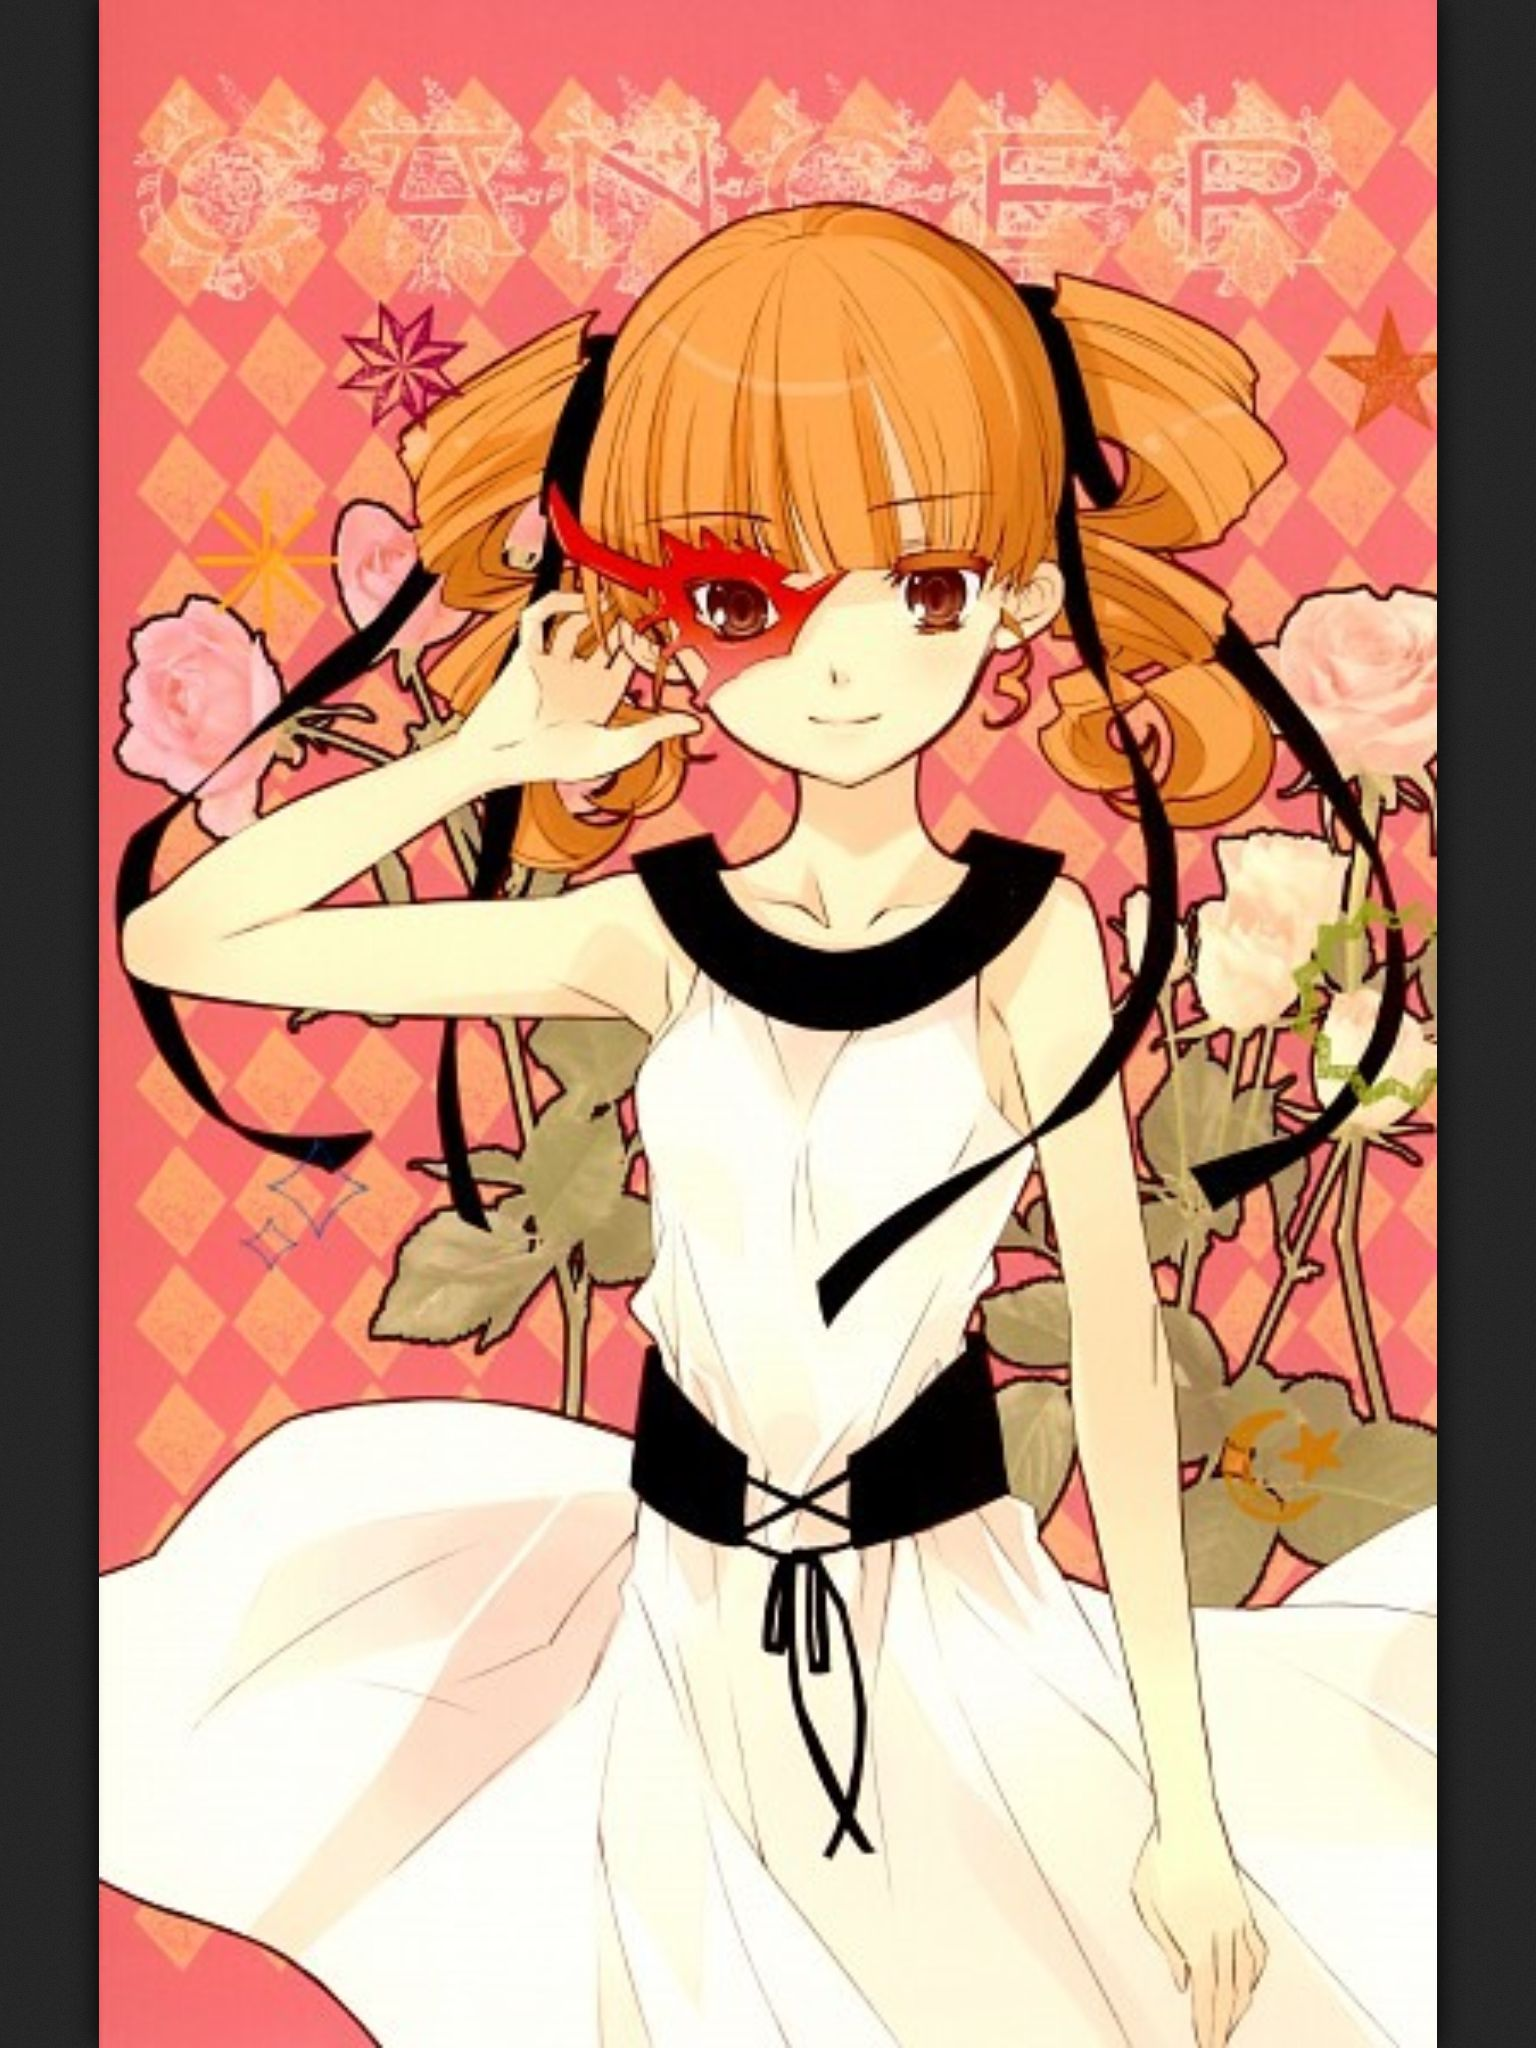 Anime Characters Zodiac Signs Libra : Anime zodiac